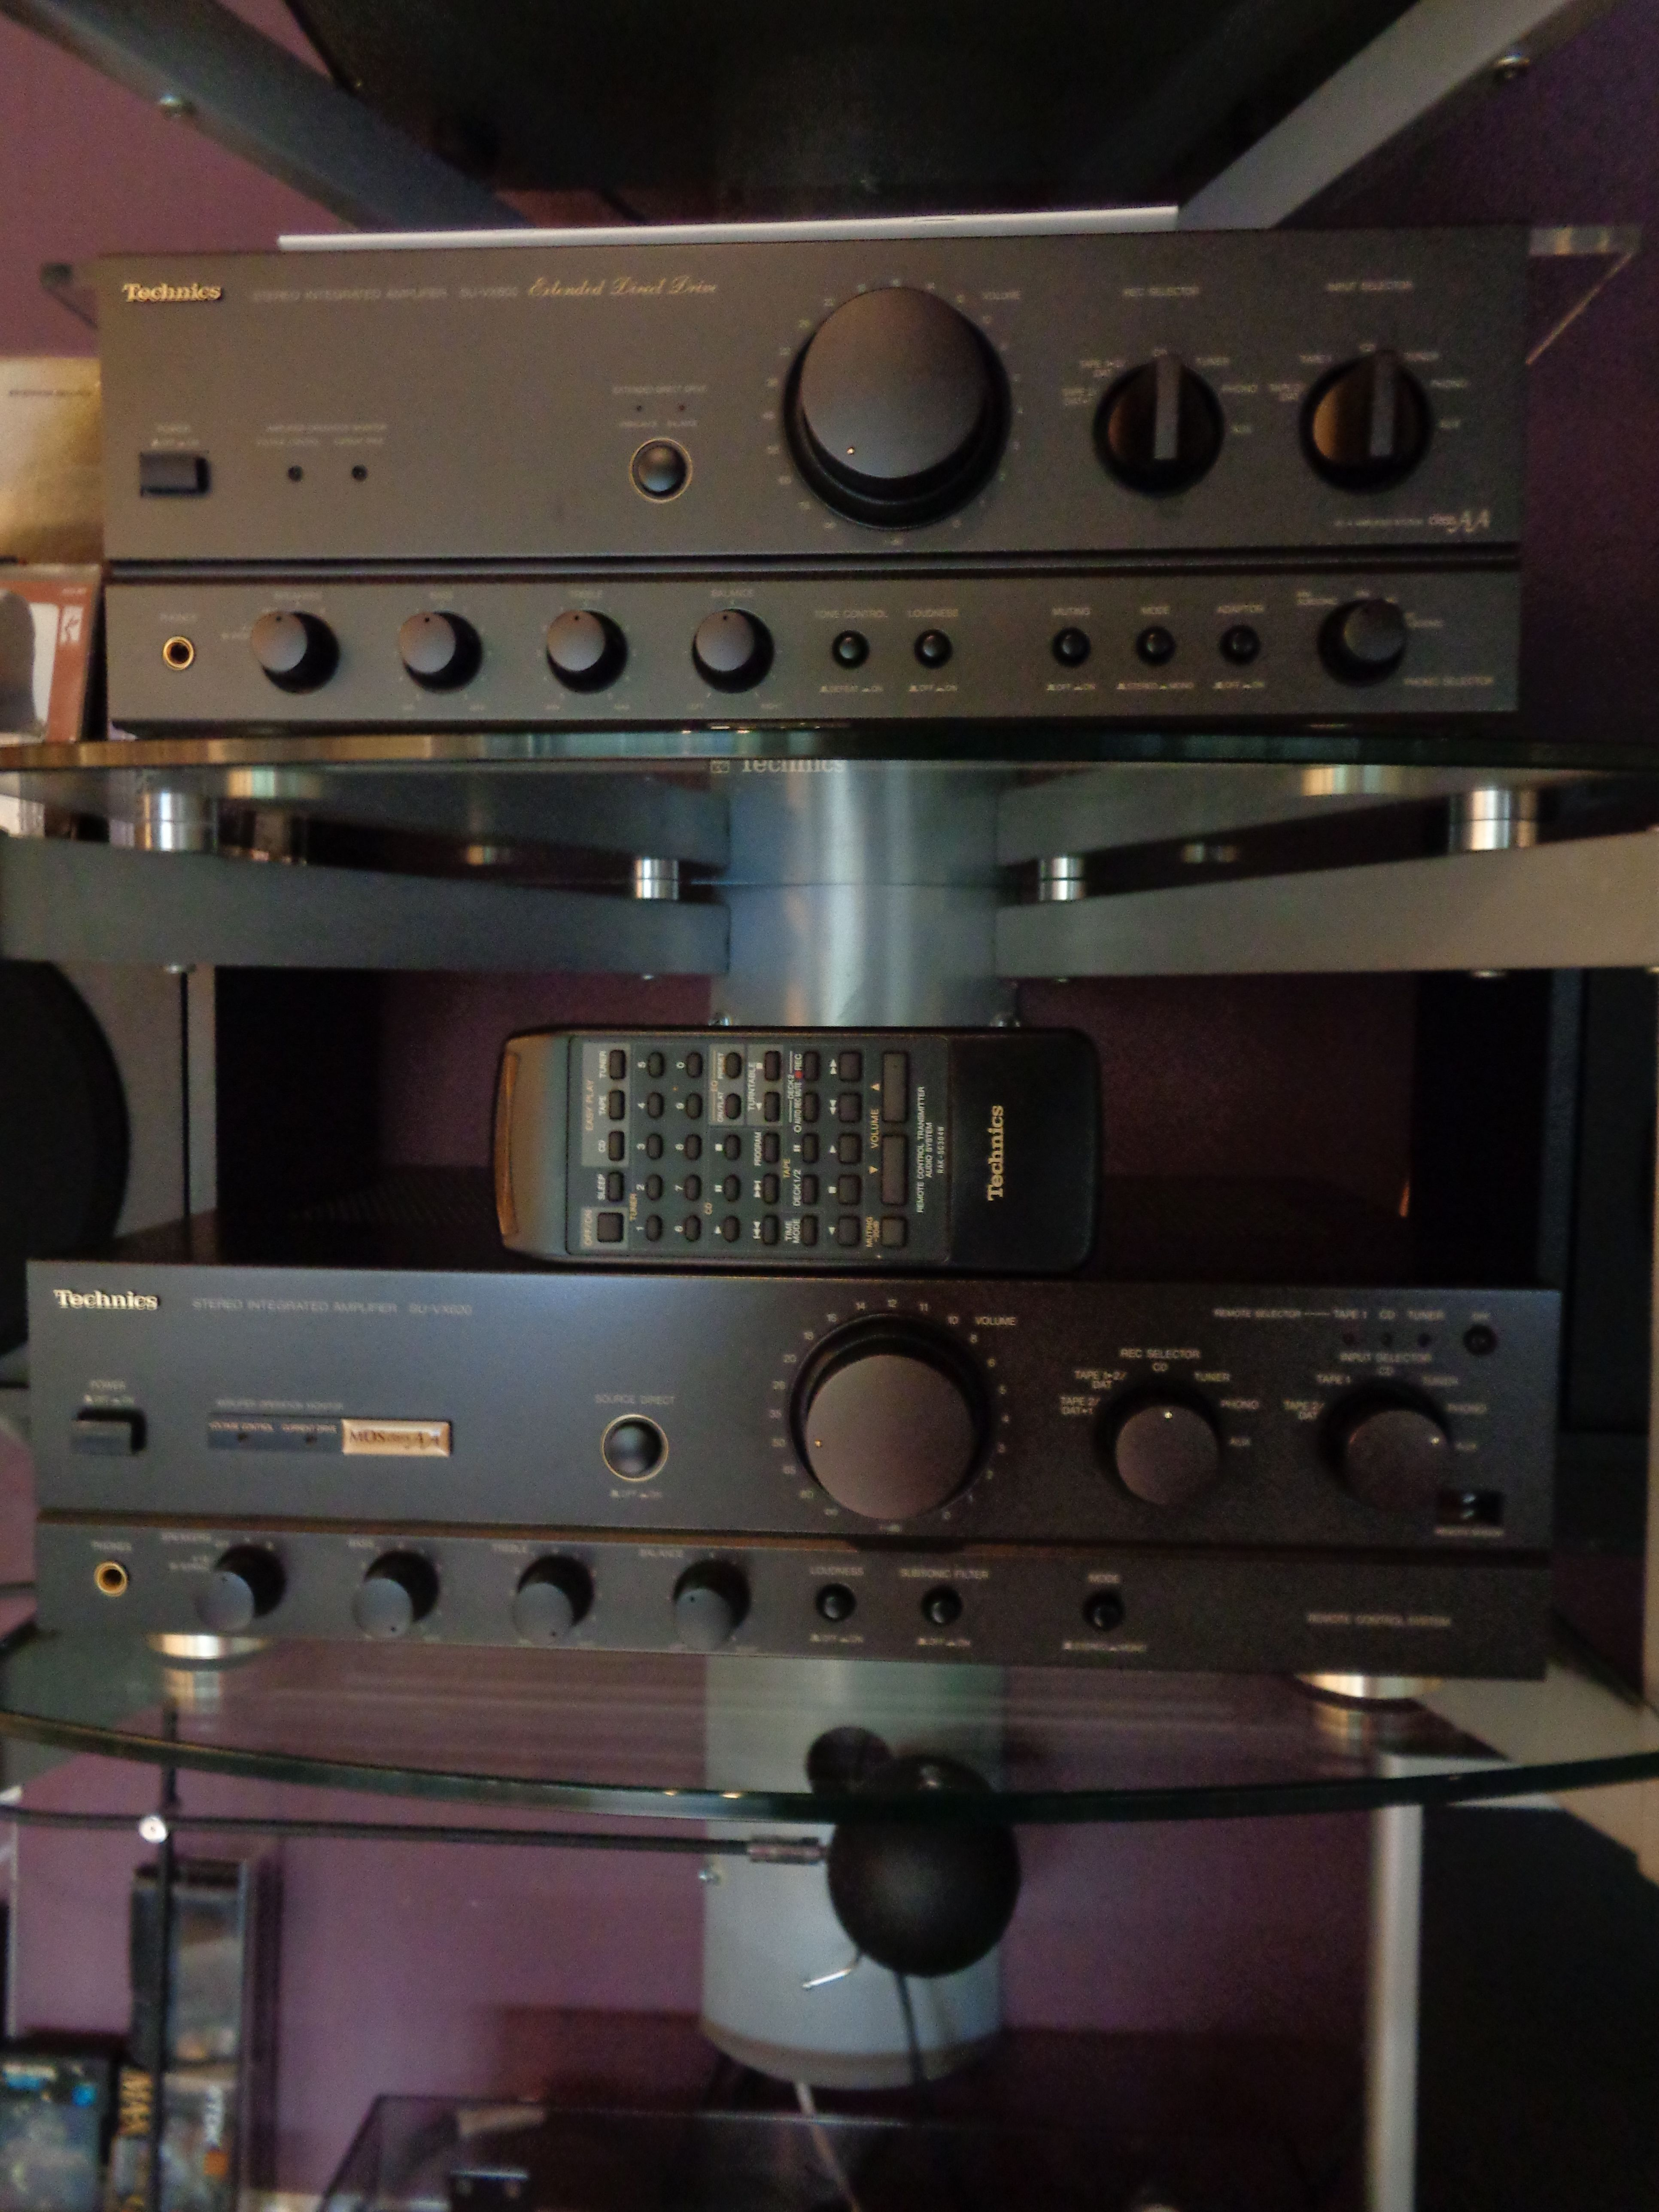 Technics SU-VX800 & SU-VX620 | Good looking stereo